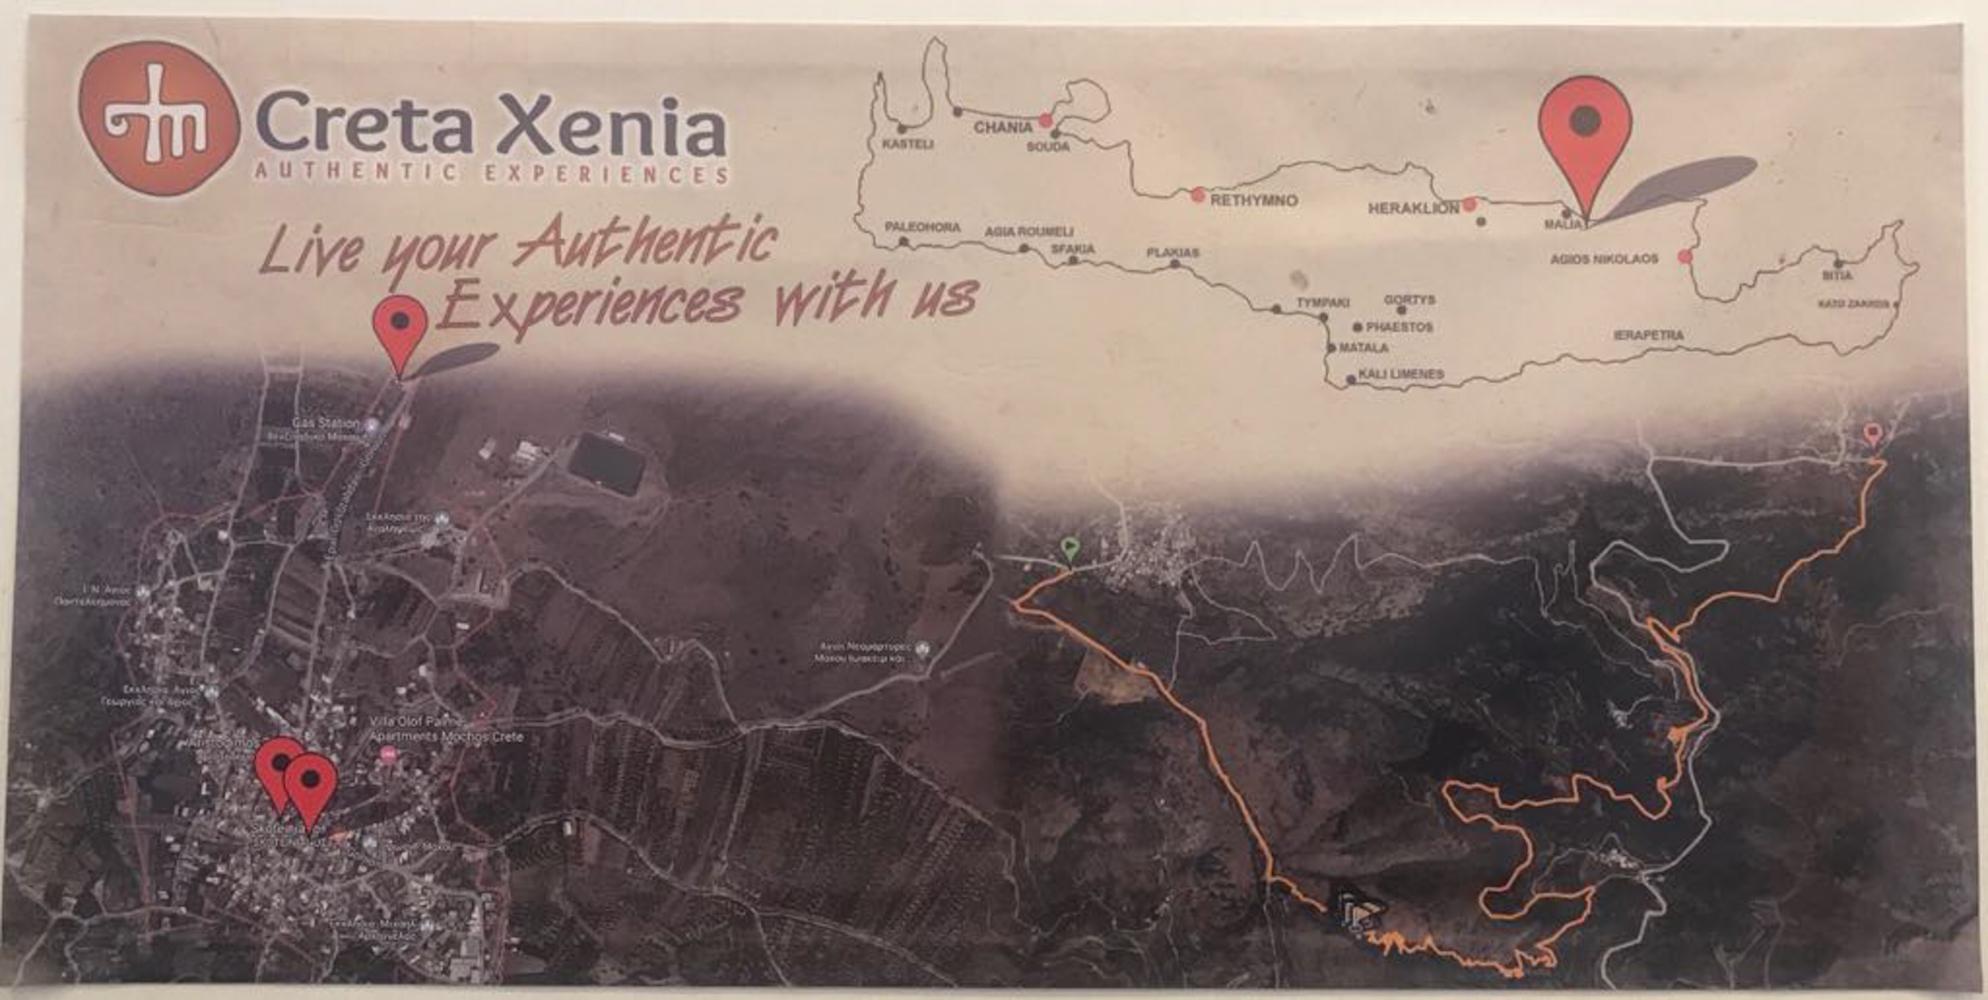 CRETA XENIA AUTHENTIC EXPERIENCES